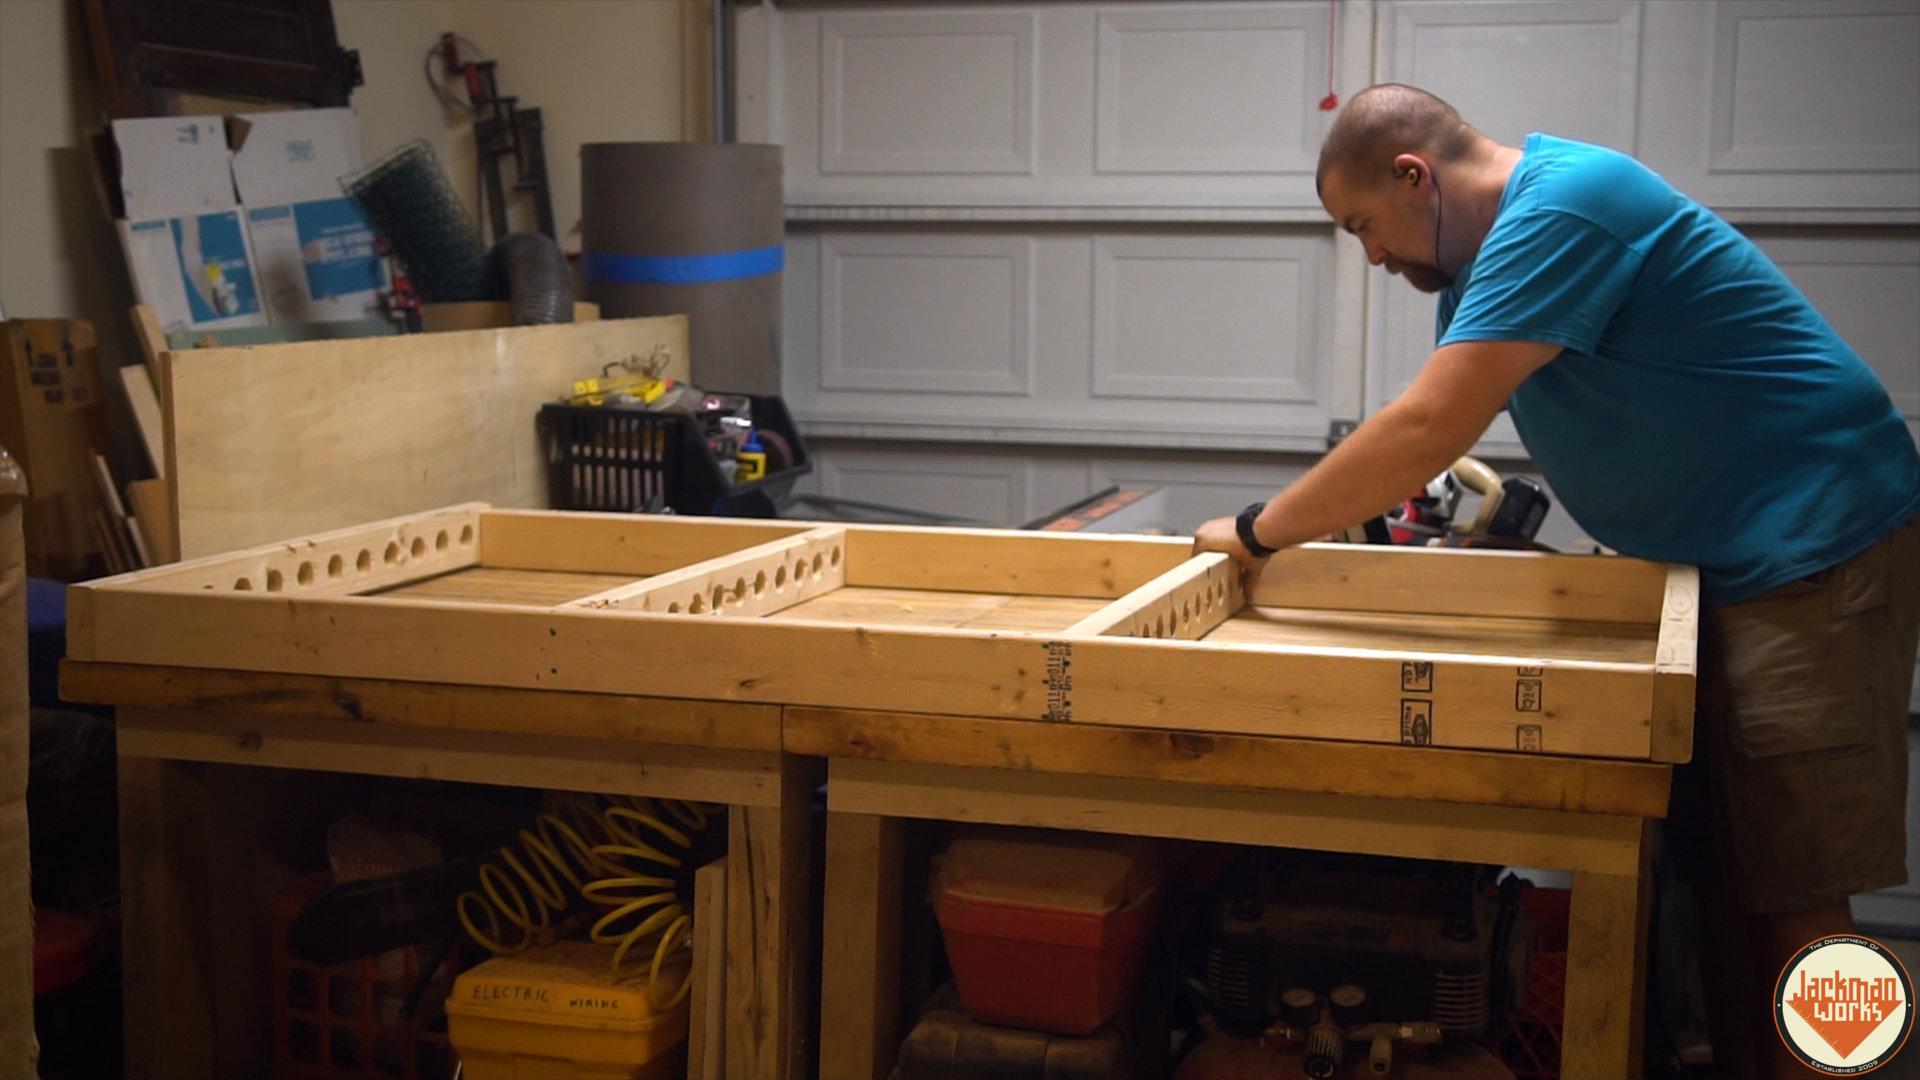 Floating Garage Storage Loft And Clamp Rack 11 Jackman Works